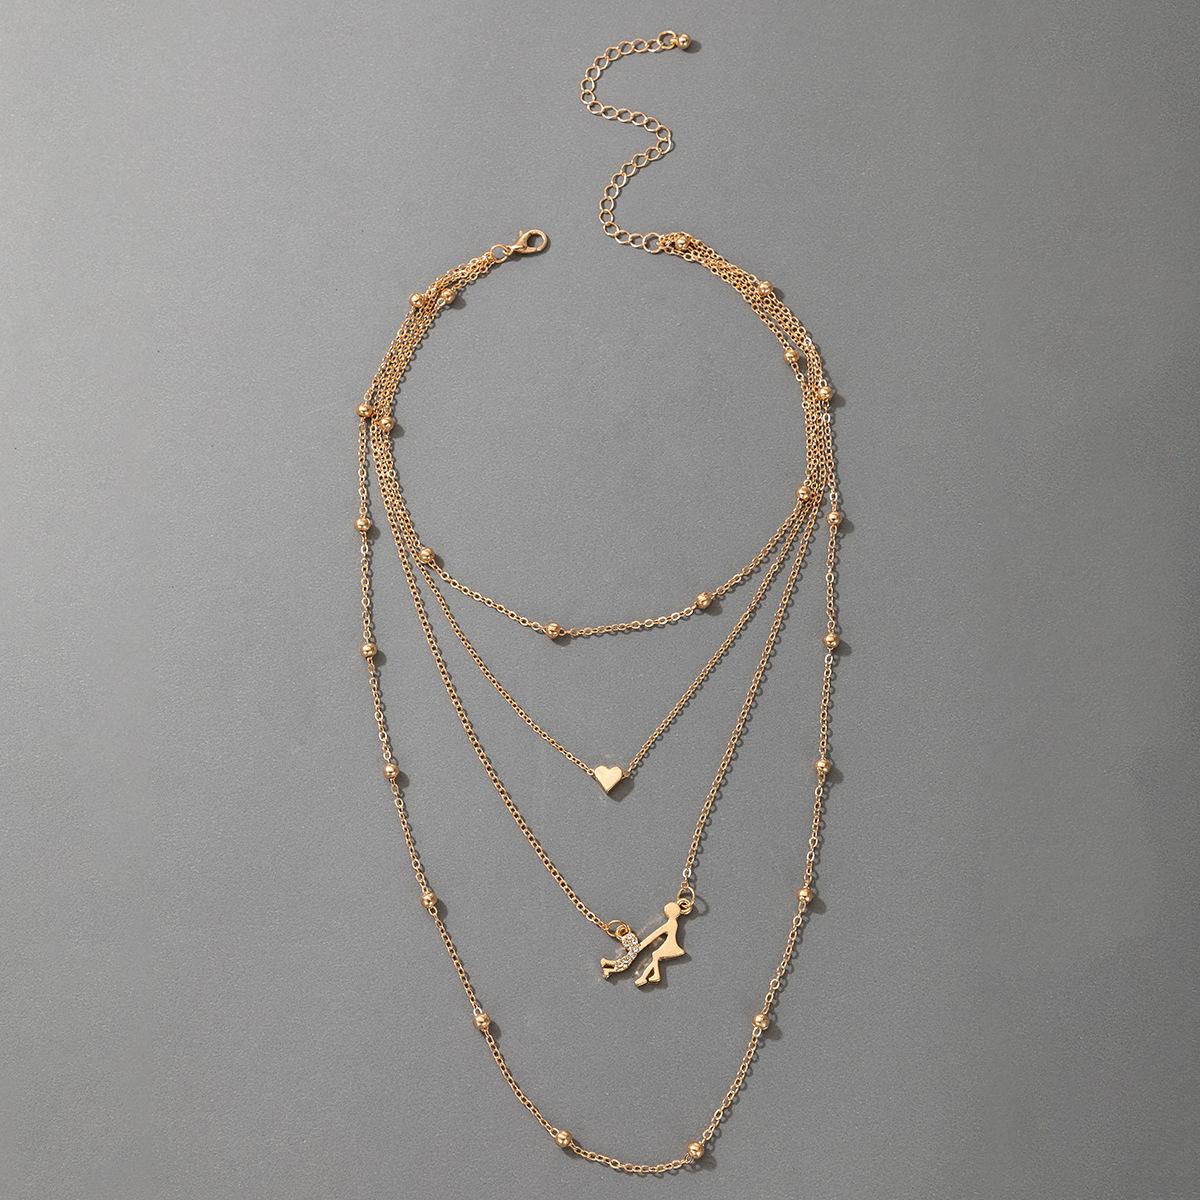 collier de coeur multicouche de mode NHGY302376